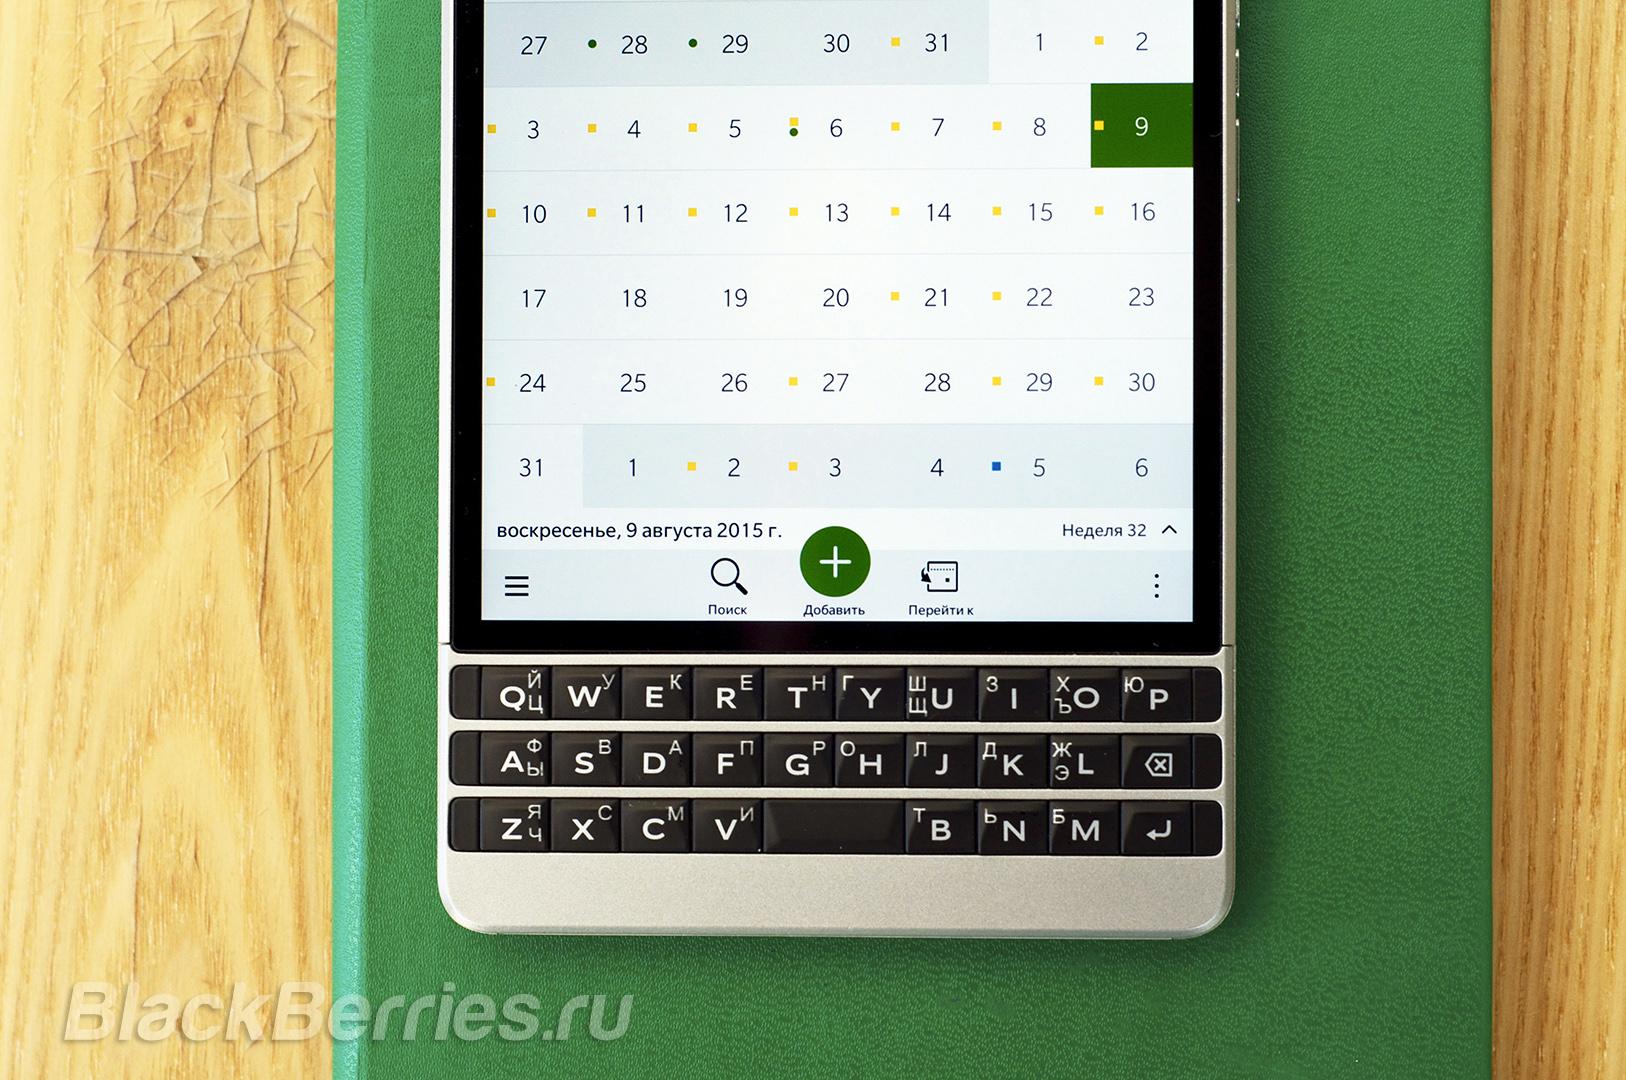 BlackBerry-Passport-Silver-Edition-RUS-2